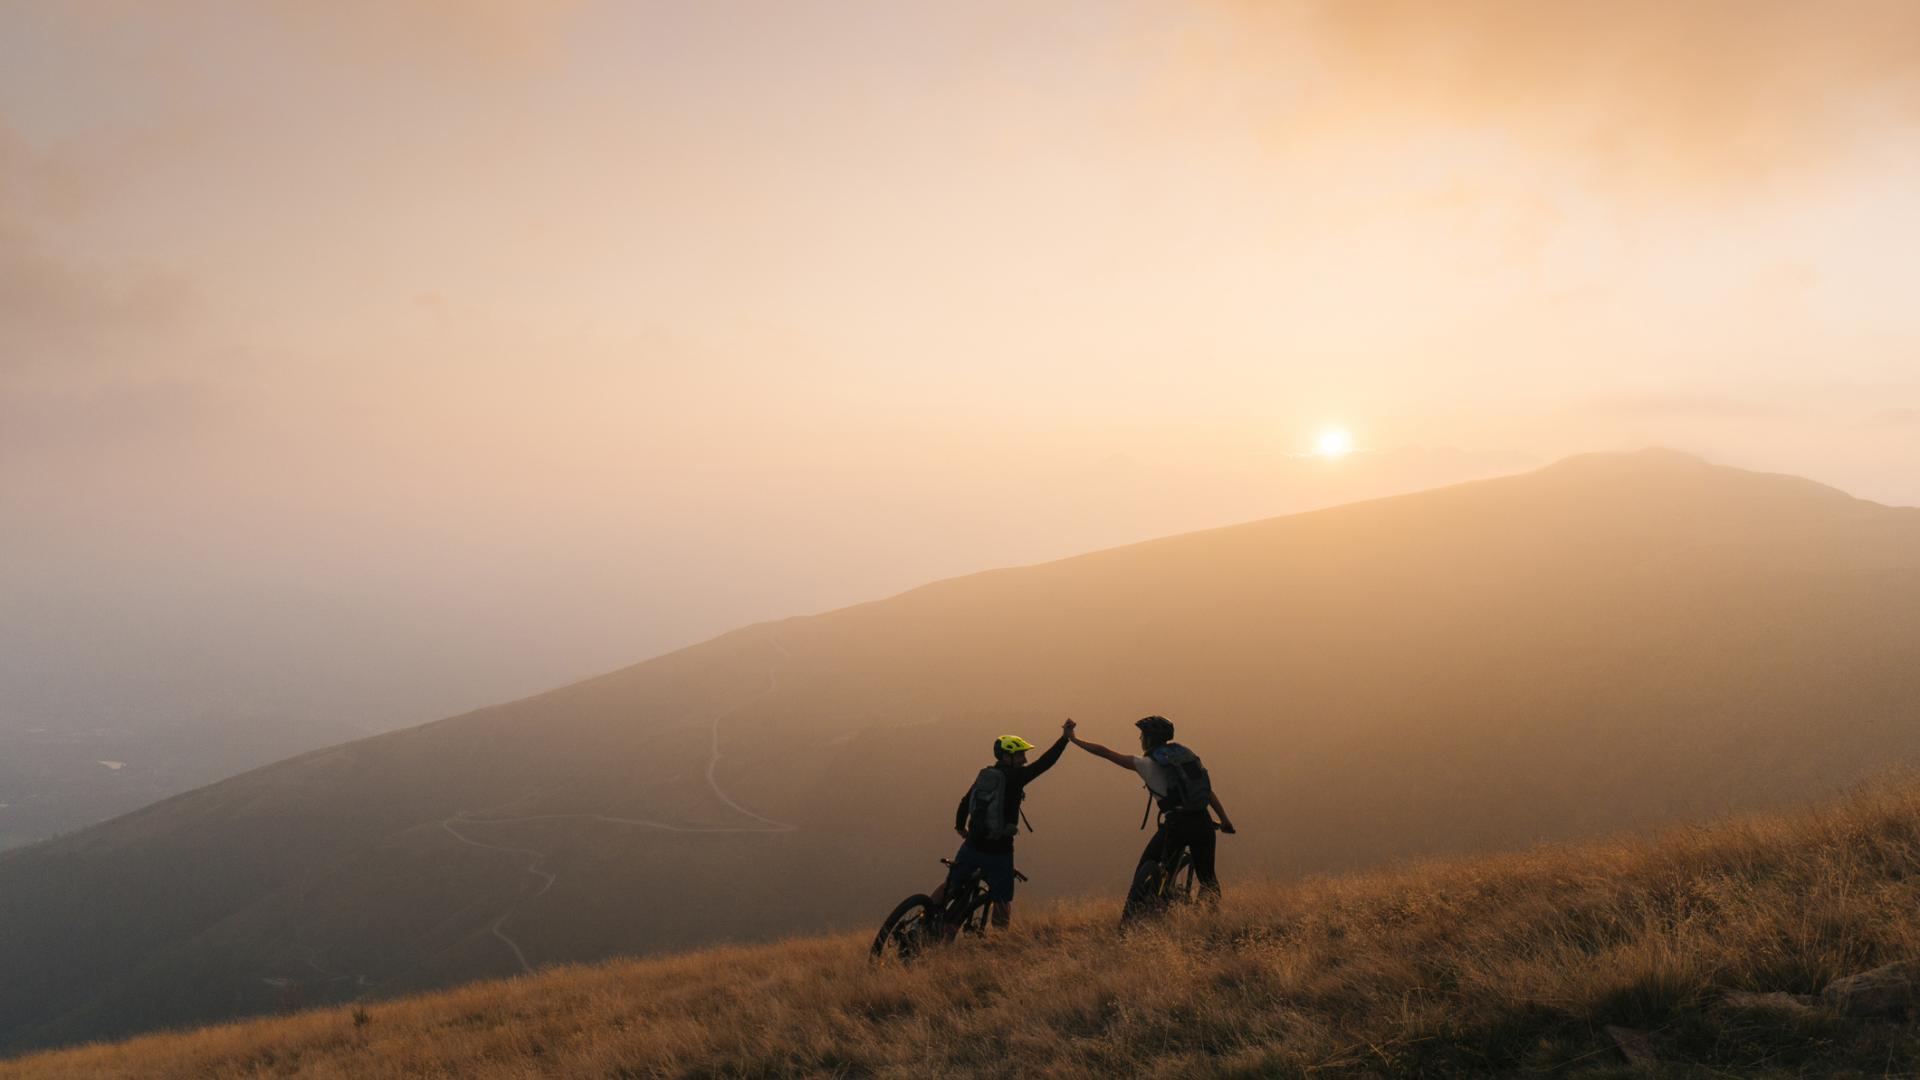 Mikroabenteuer Fahrrad Berge Natur Sonnenaufgang